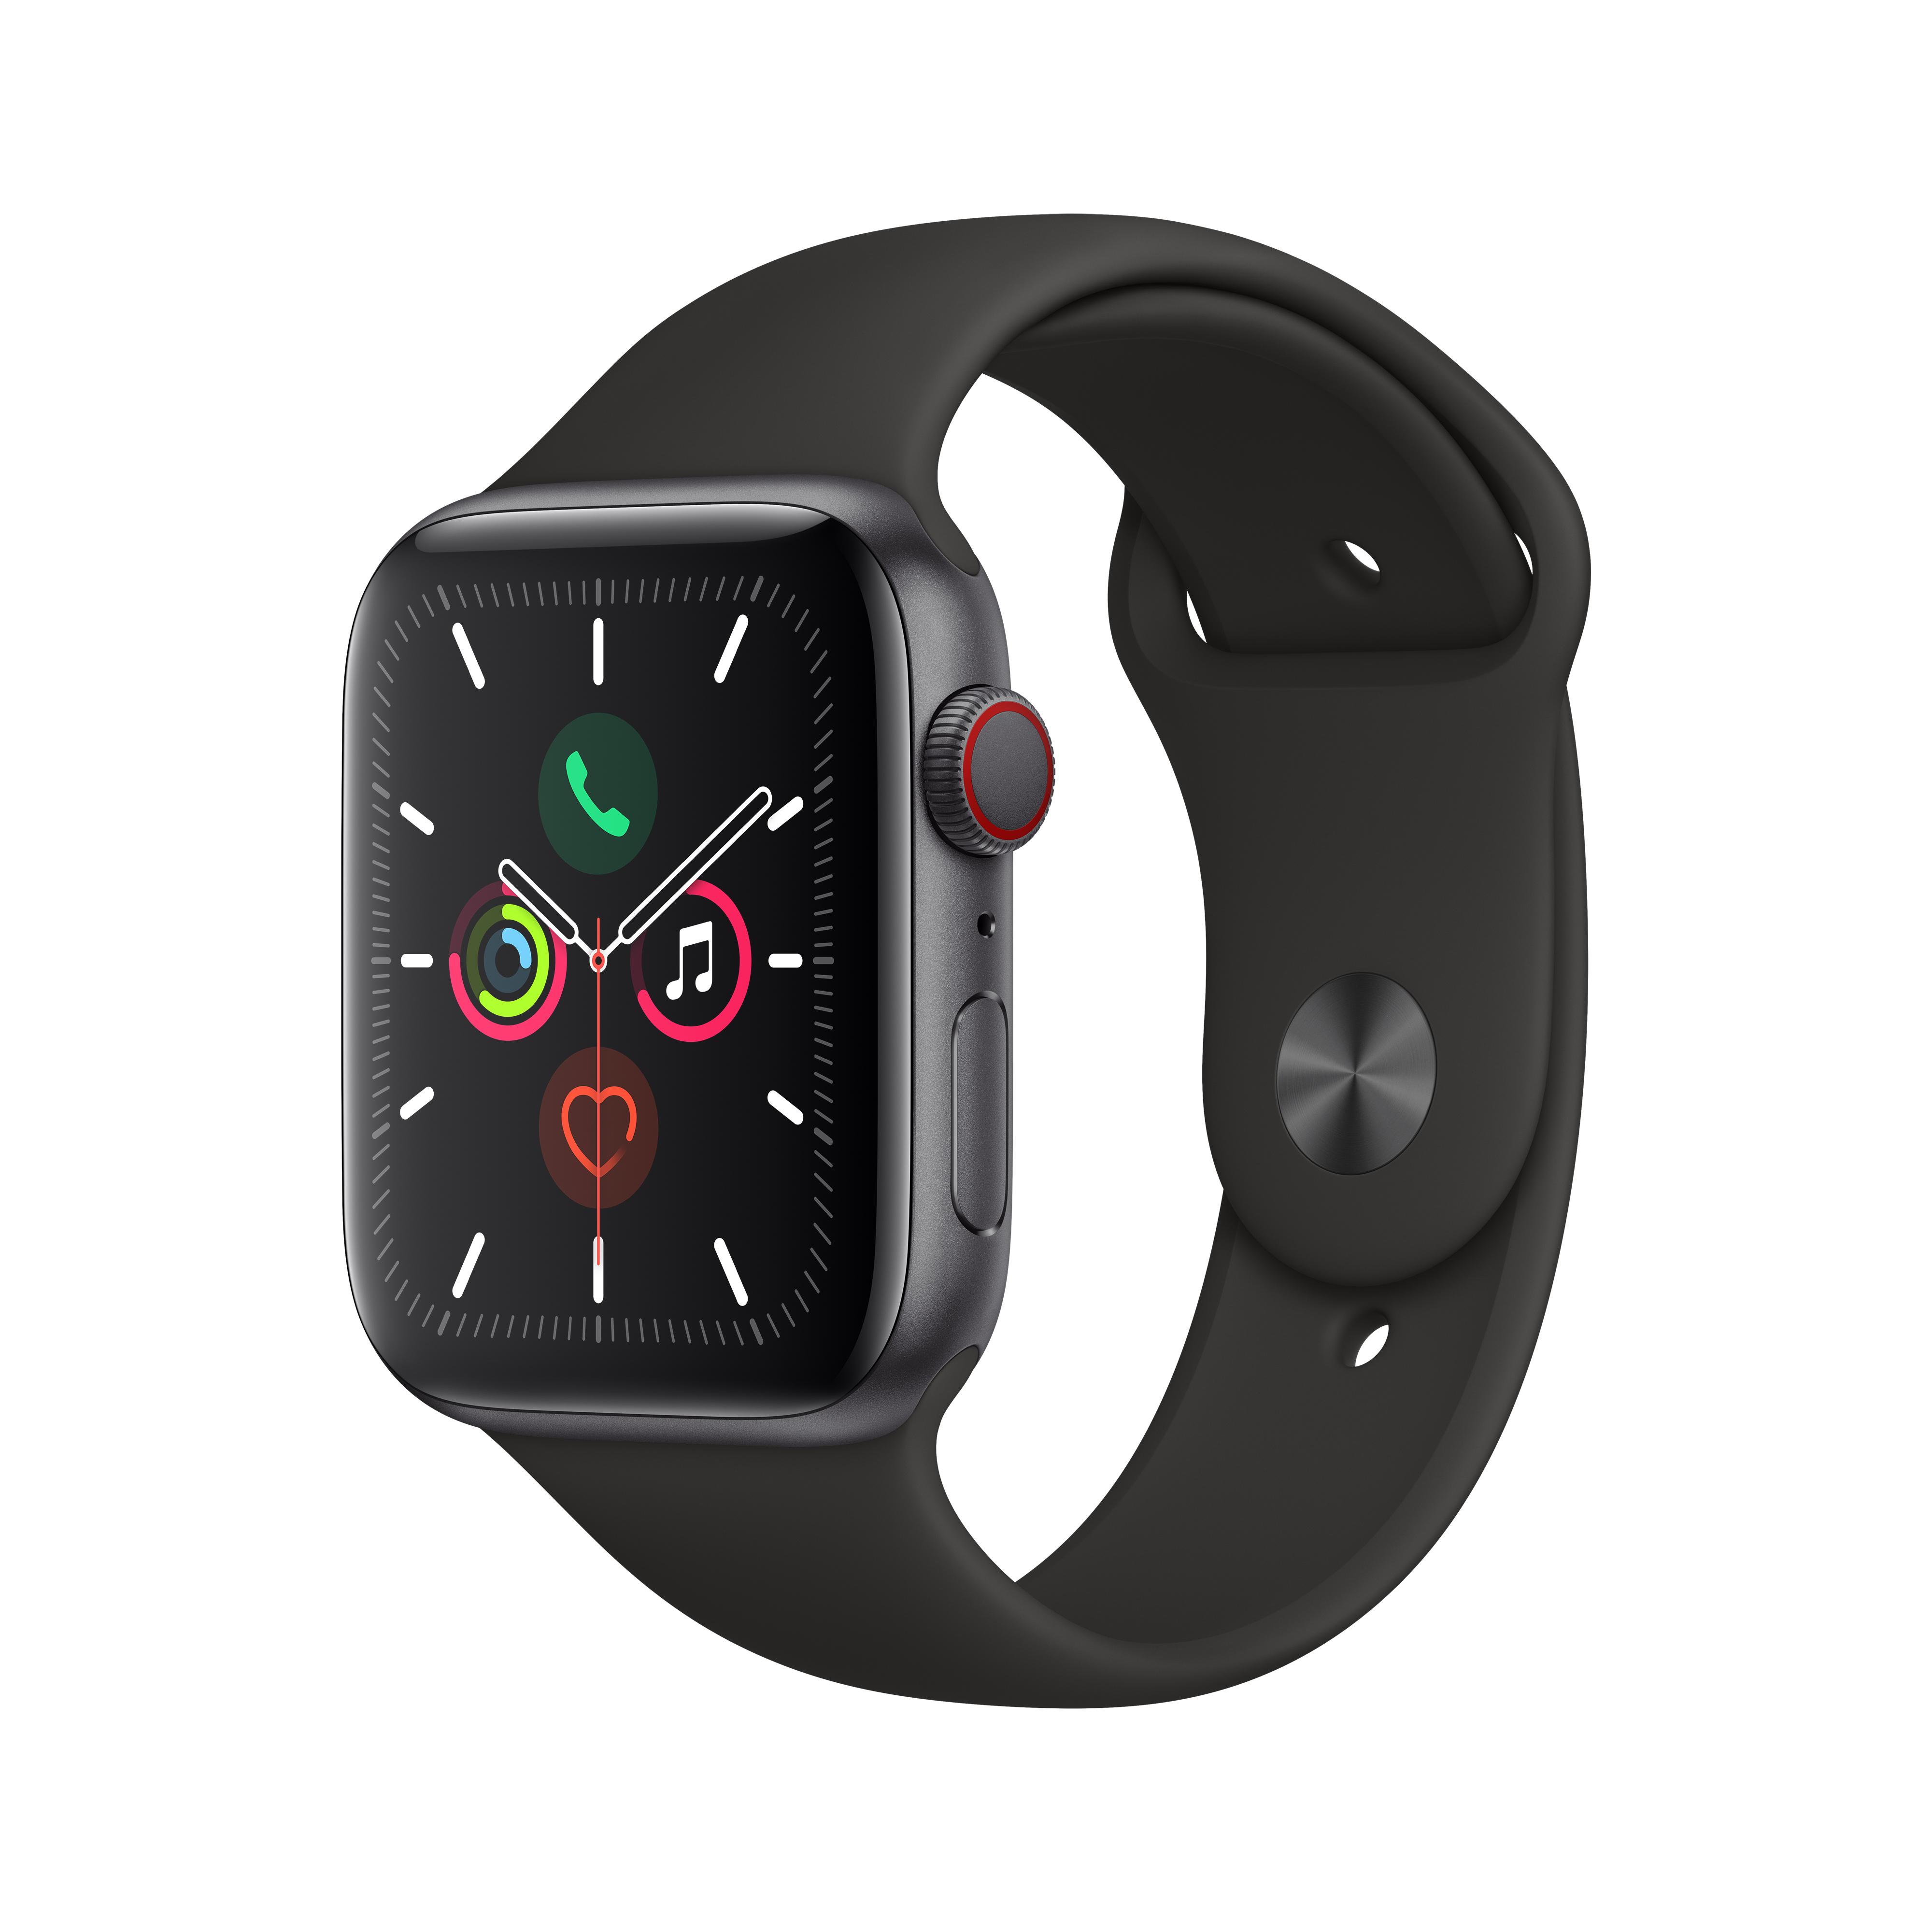 Apple 애플워치5 GPS + 셀룰러 44mm 스포츠밴드 + 알루미늄케이스, 스페이스 그레이(MWWE2KH/A), 블랙(밴드)